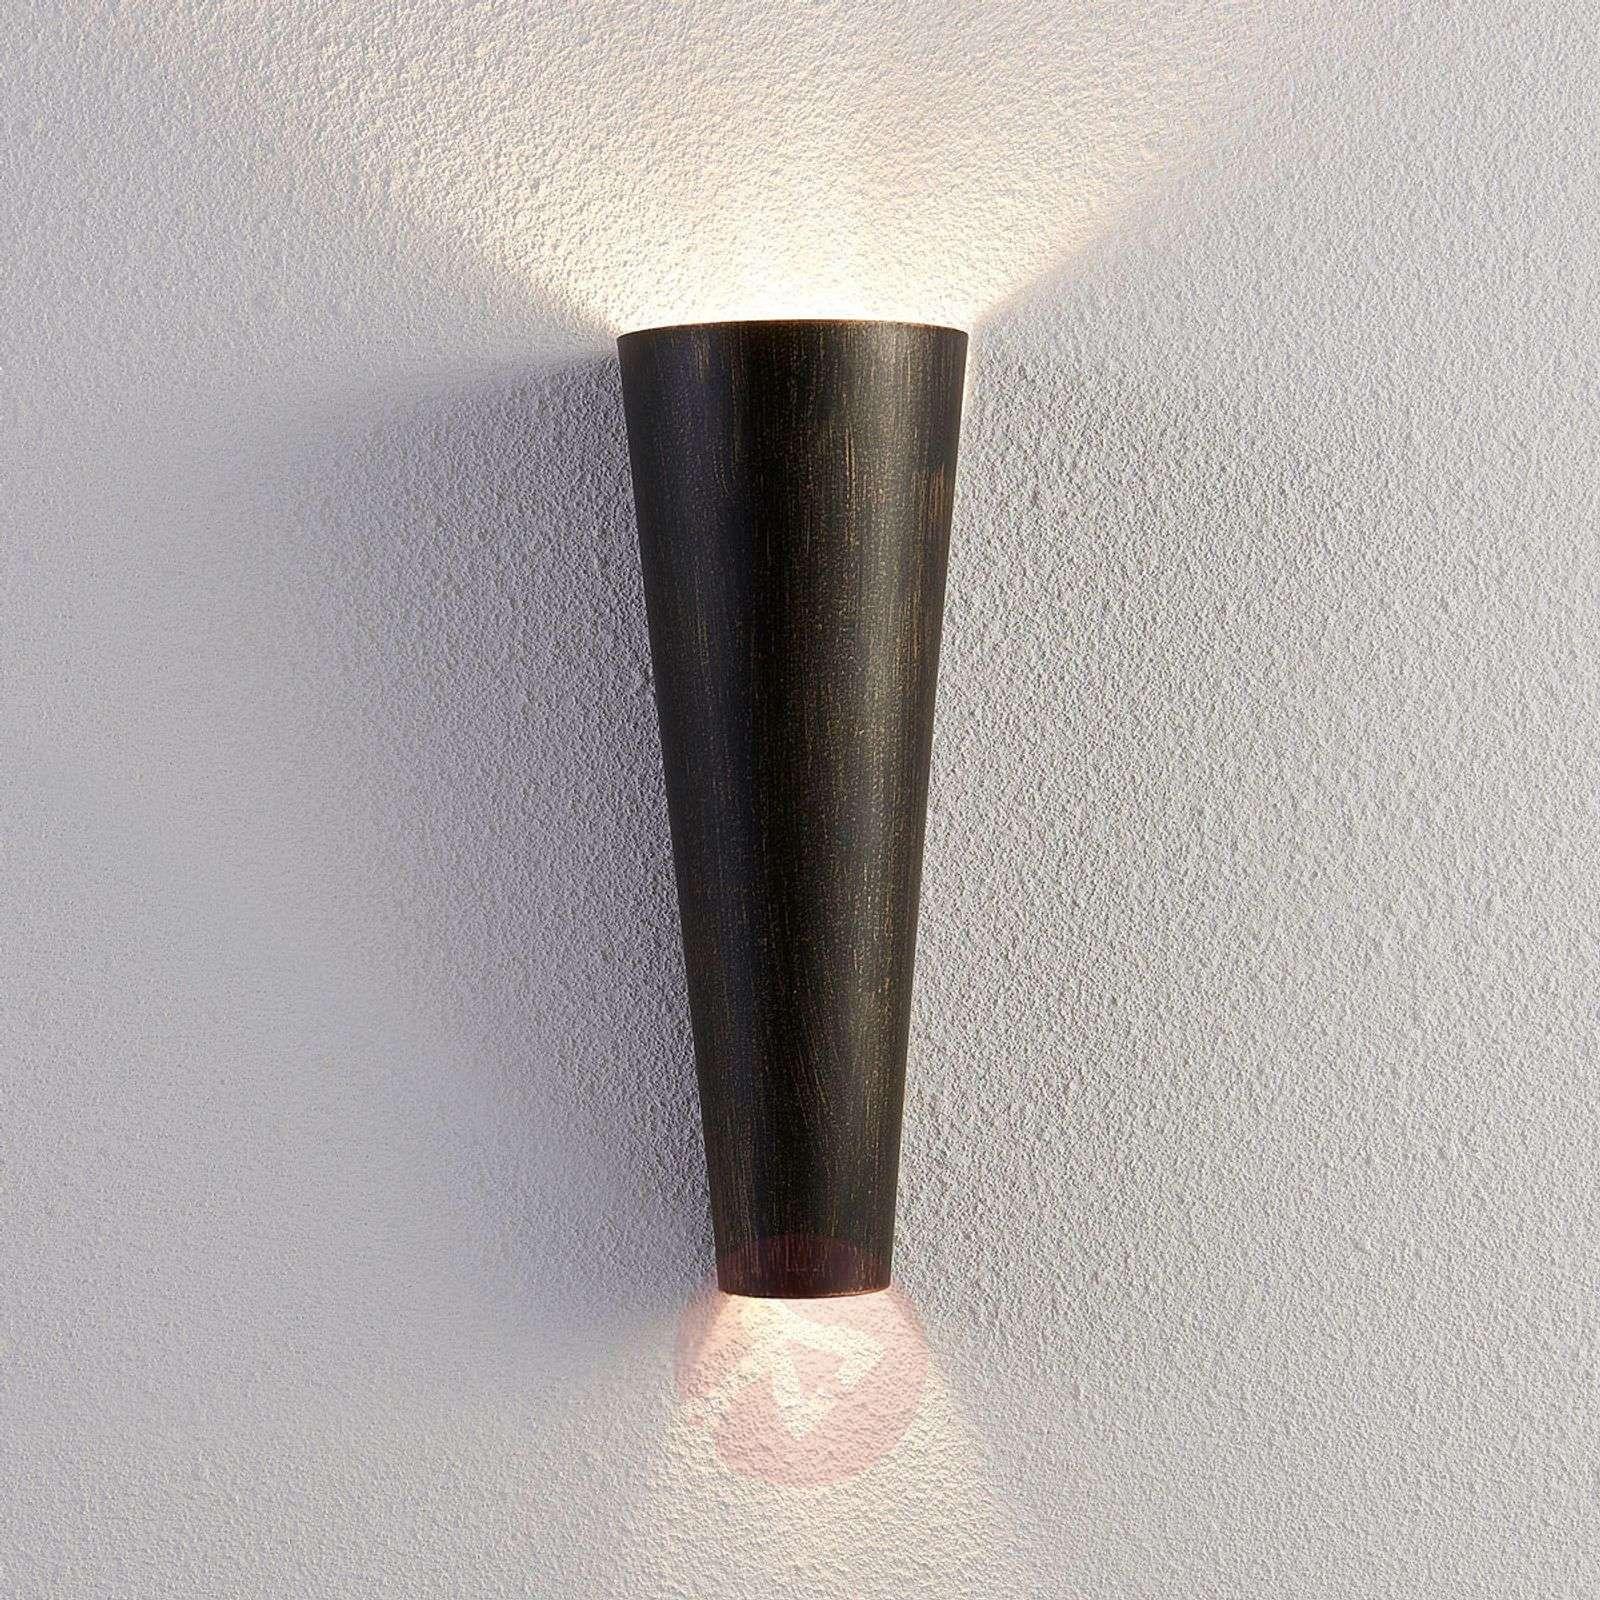 indirect wall lighting. Black Gold Wall Light Conan, Indirect Light-9620935-03 Lighting